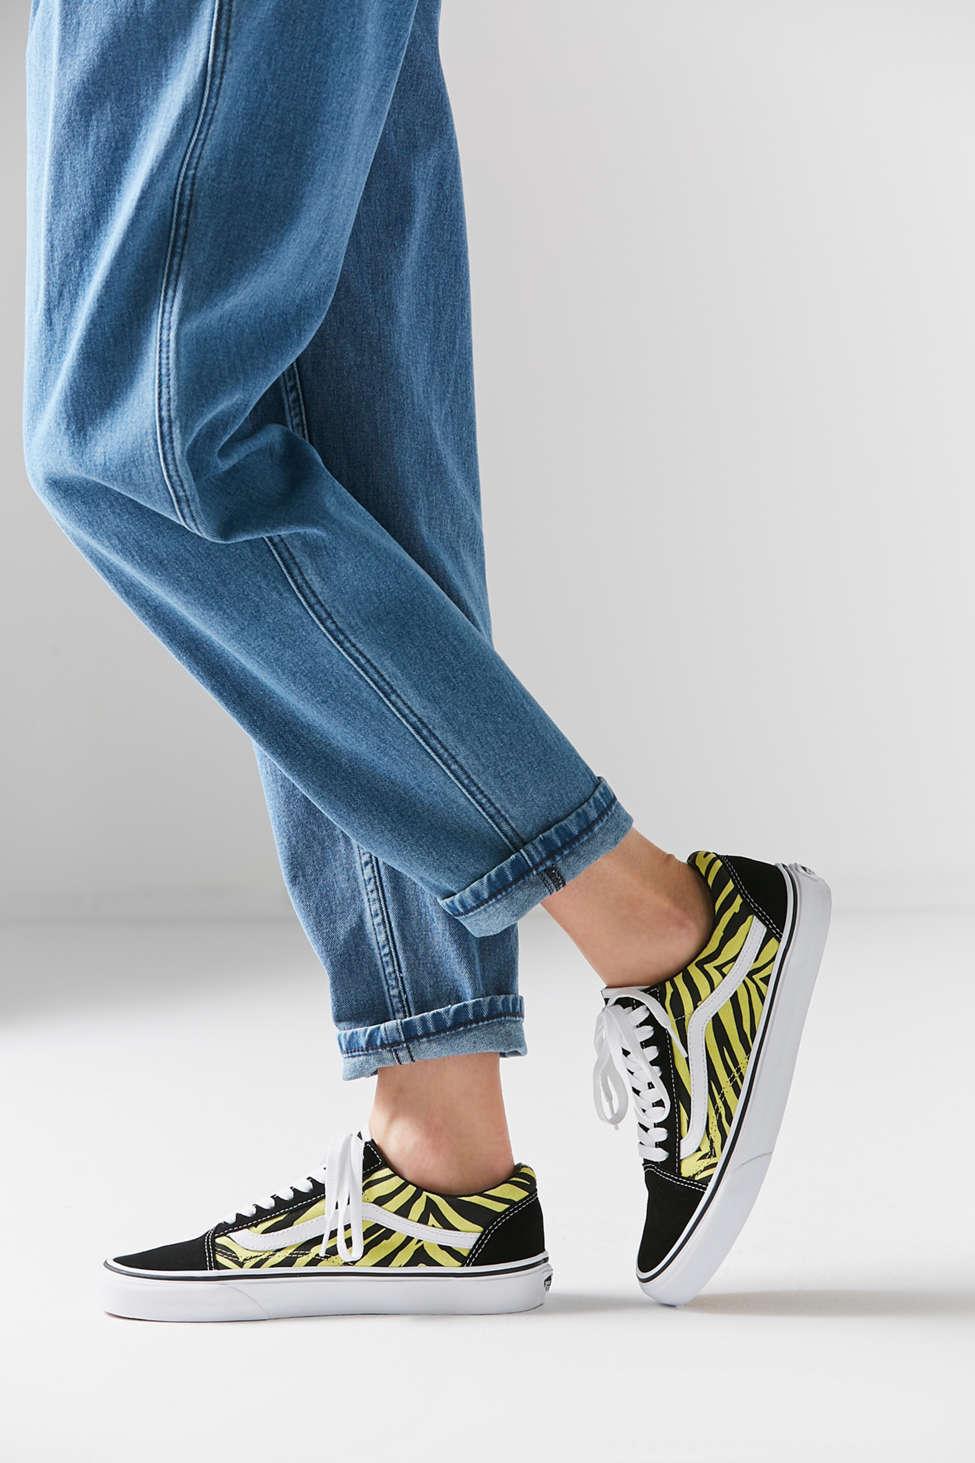 Vans Old Skool Zebra Sneaker